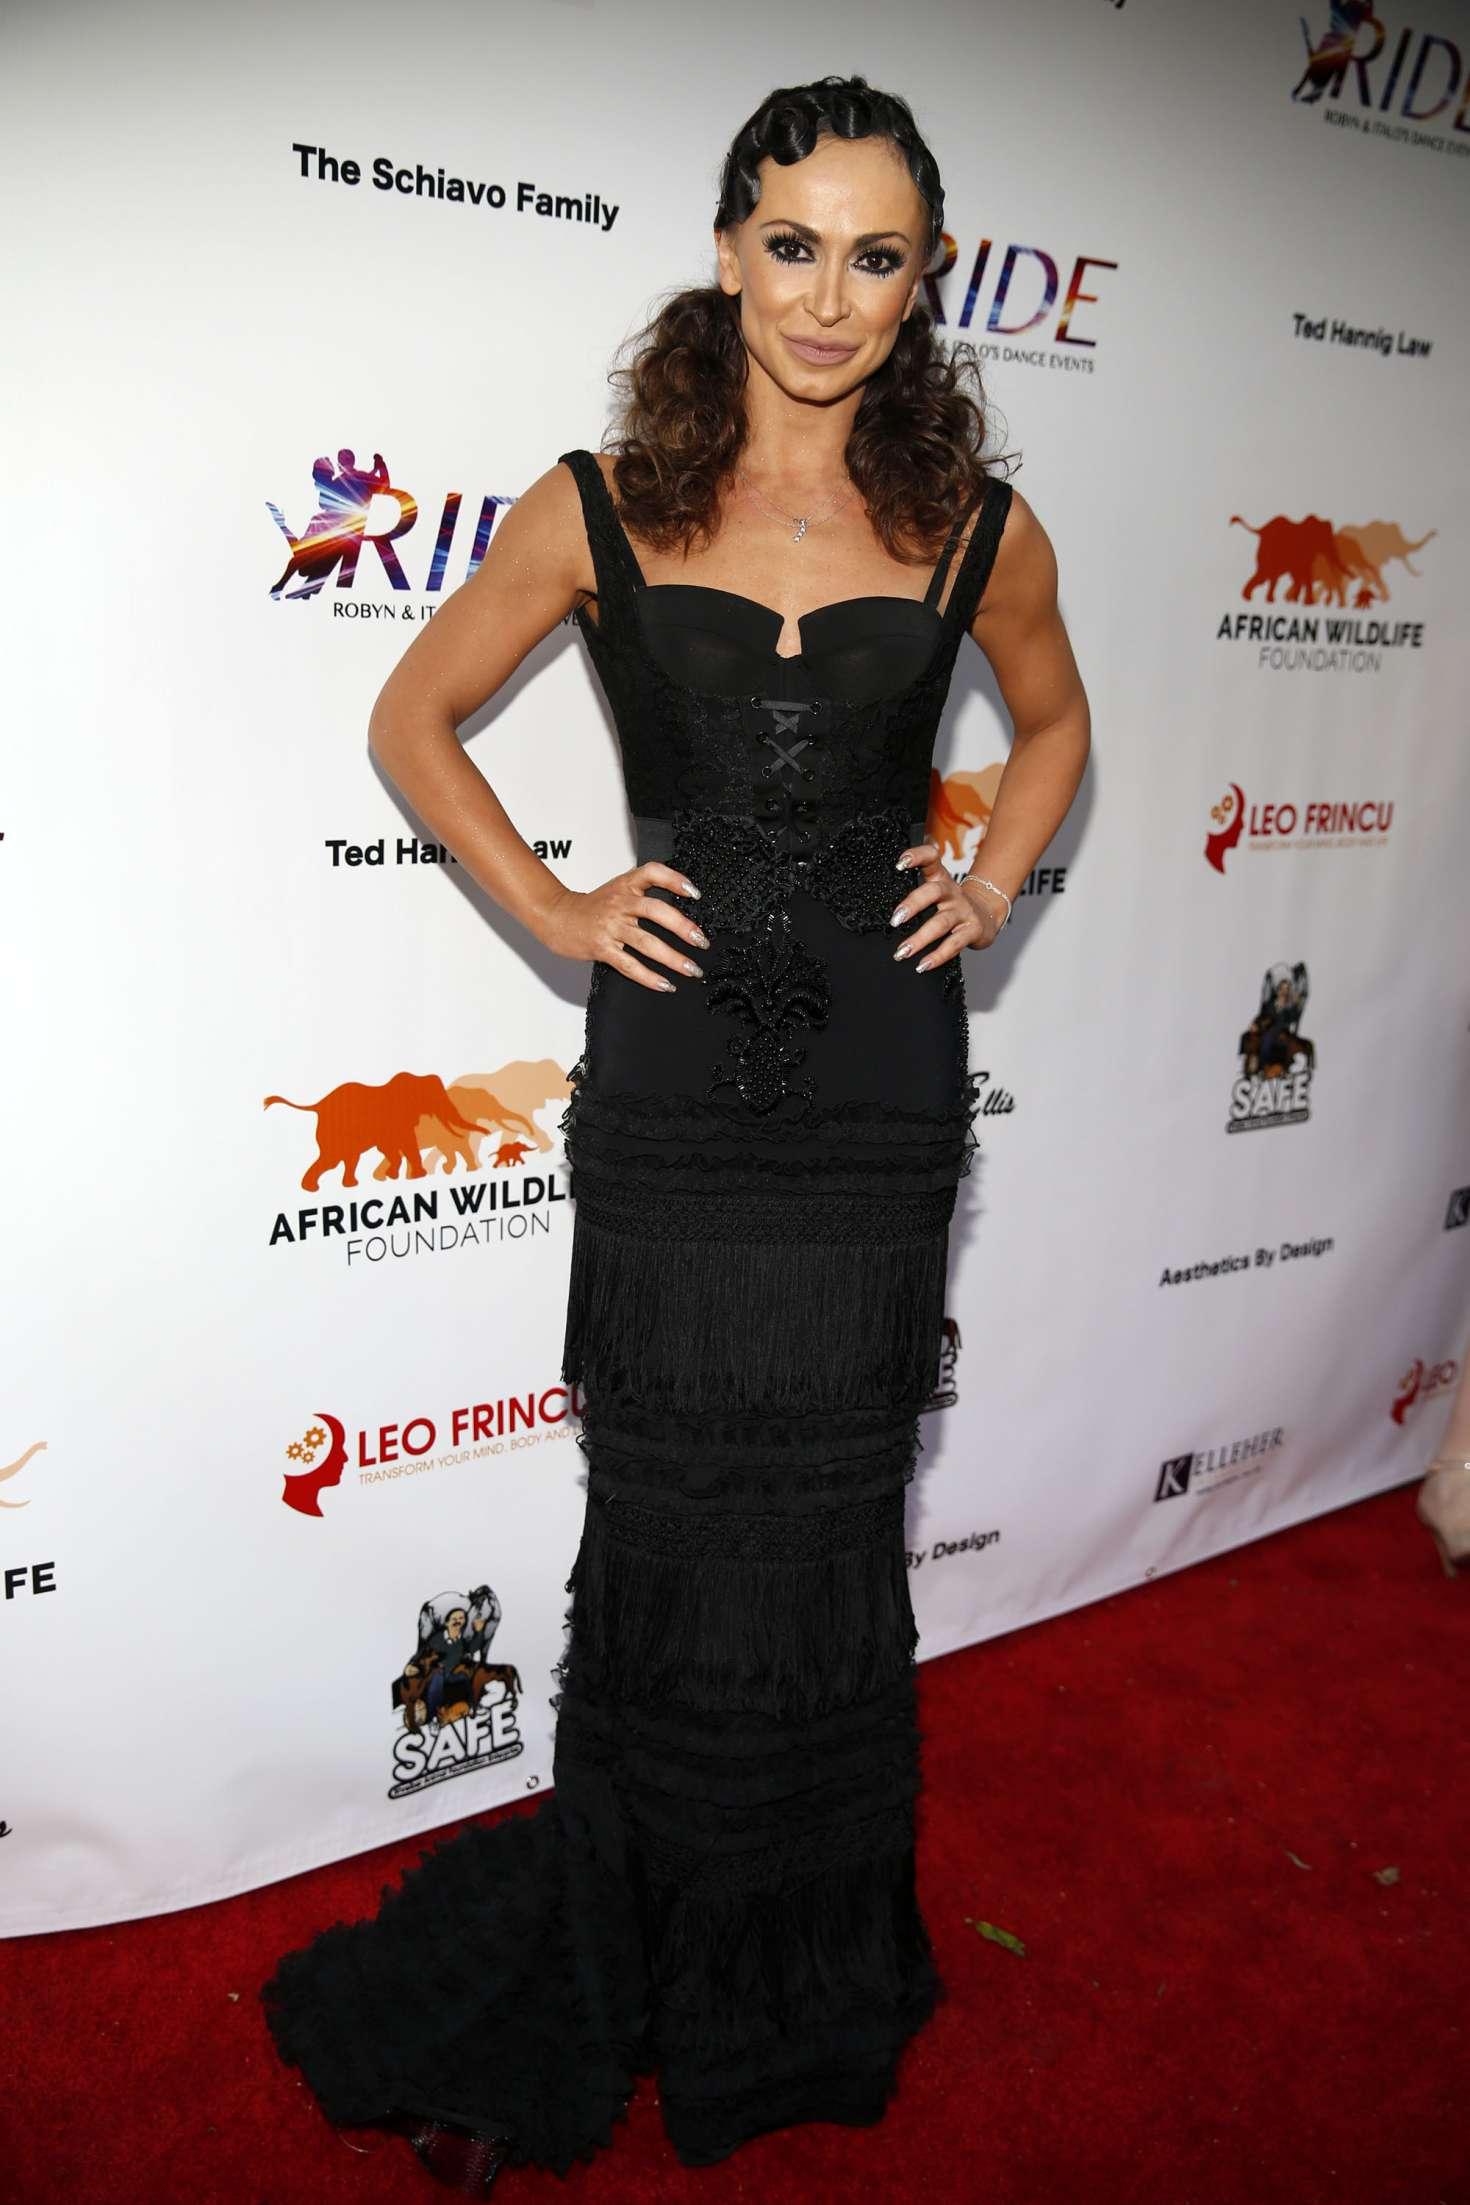 Karina Smirnoff - Ride Foundation inaugural gala dance for Africa in Hollywood